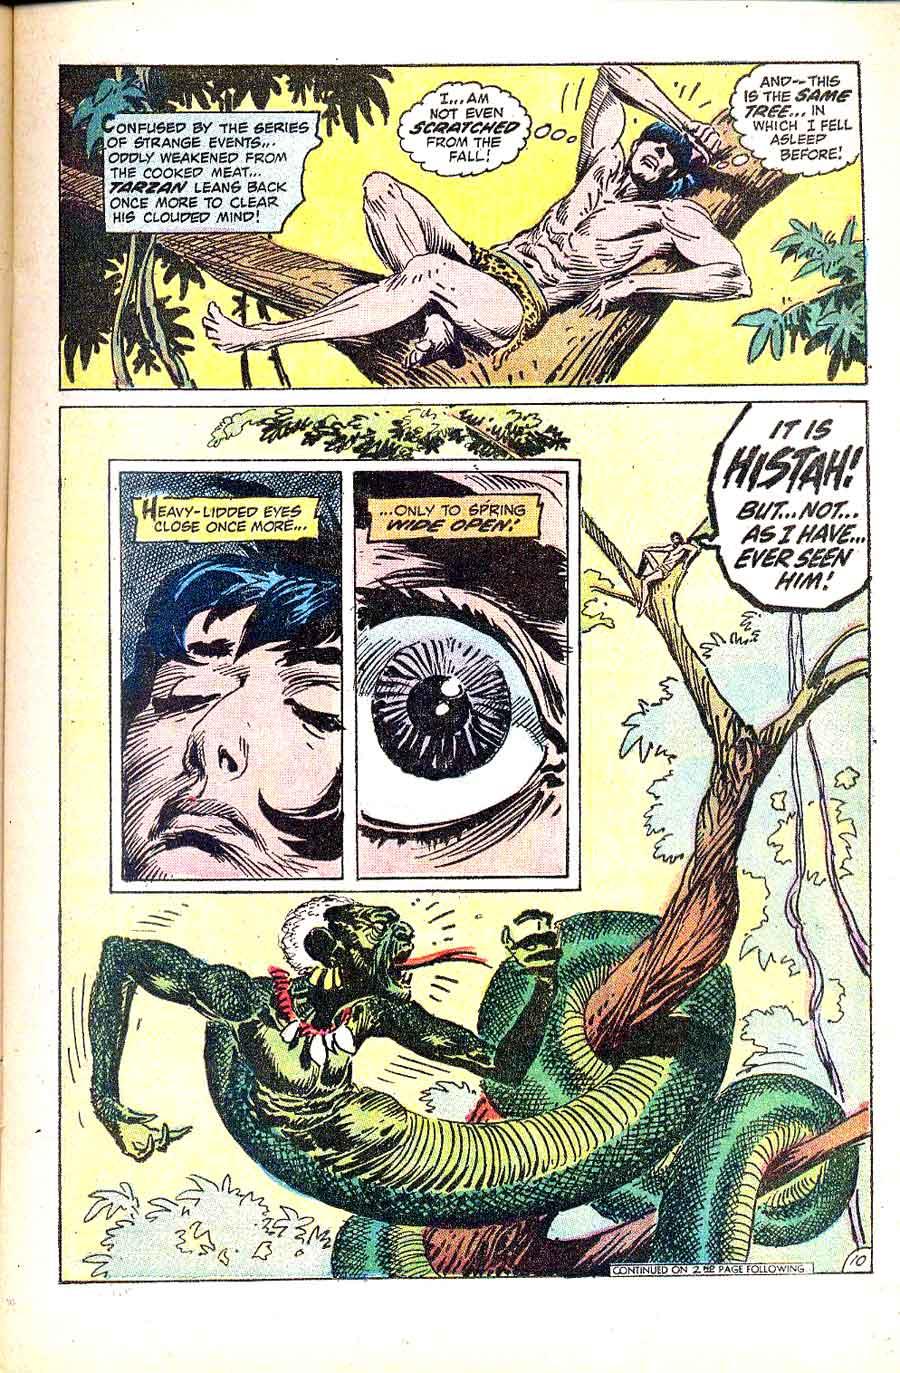 Tarzan v1 #214 dc comic book page art by Joe Kubert